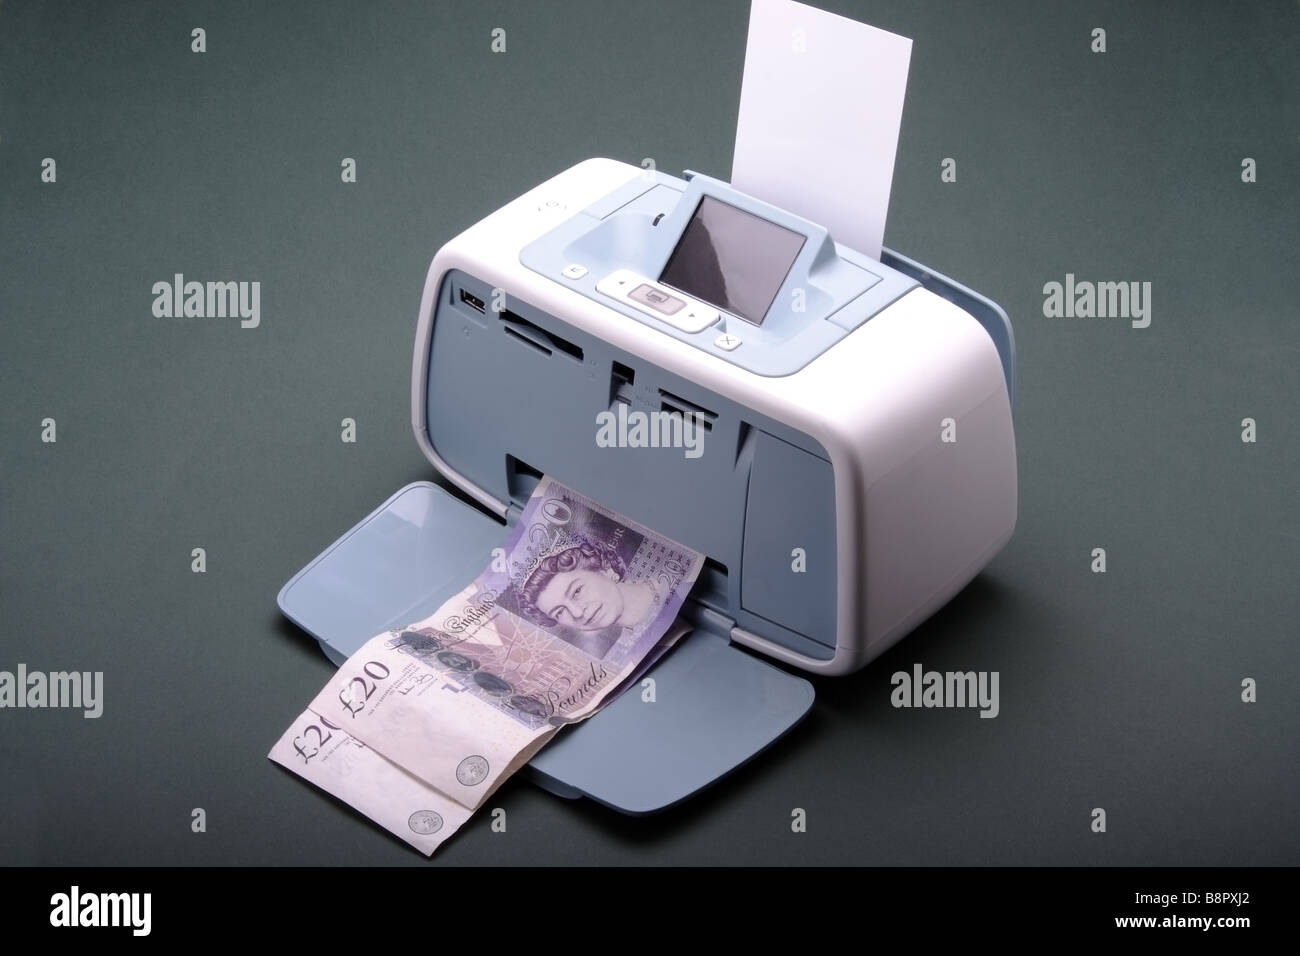 Quantitative Easing Printing Money #4 Stock Photo: 22631450